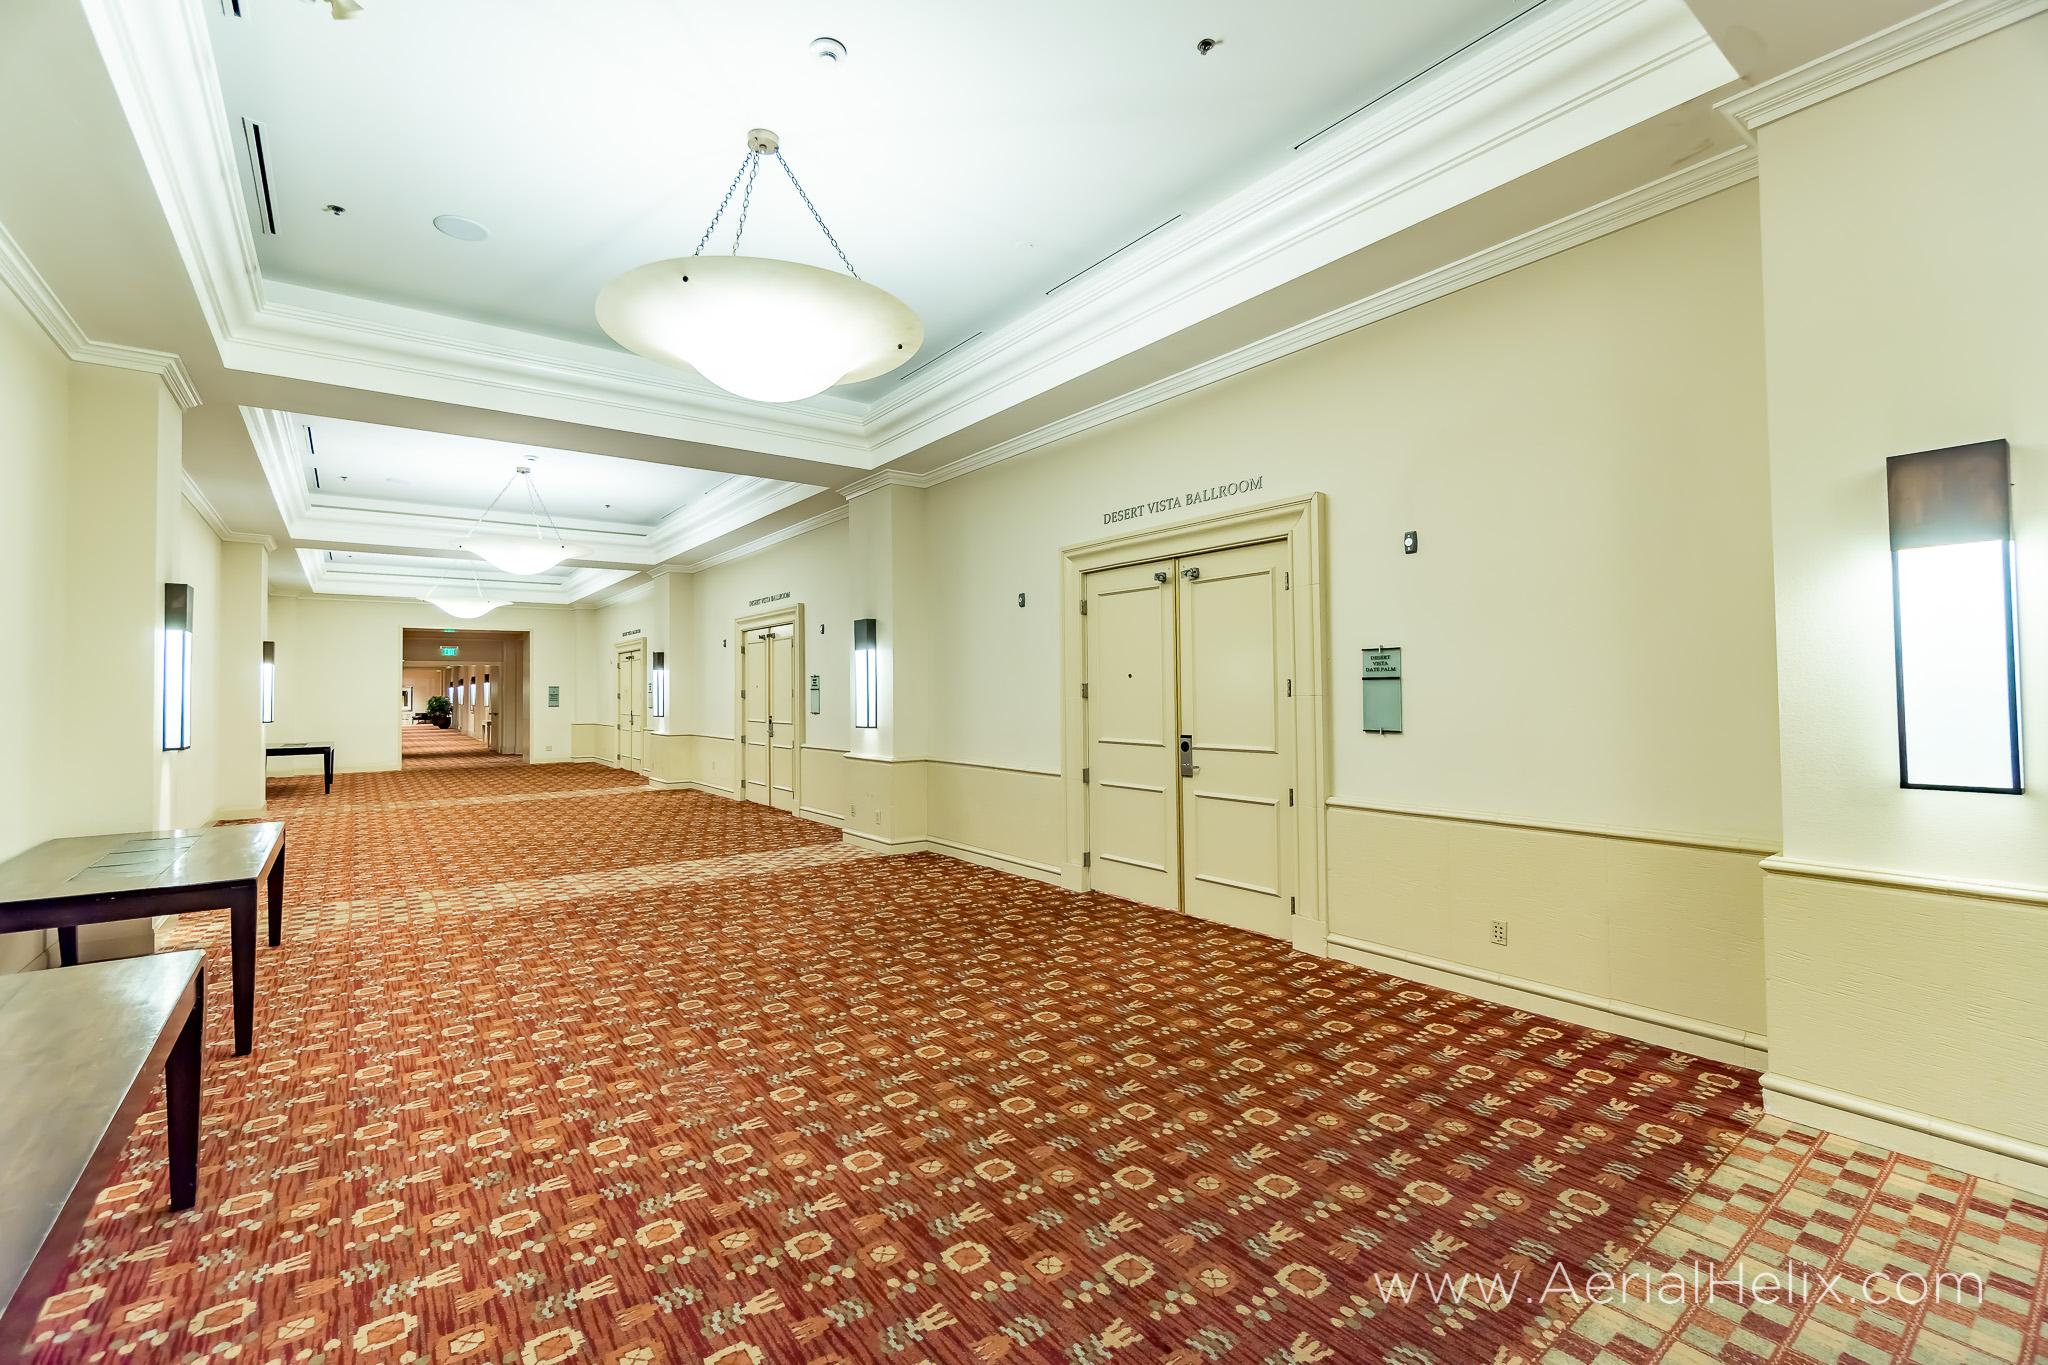 Indian Wells Hyatt Regency Set 1-17.jpg